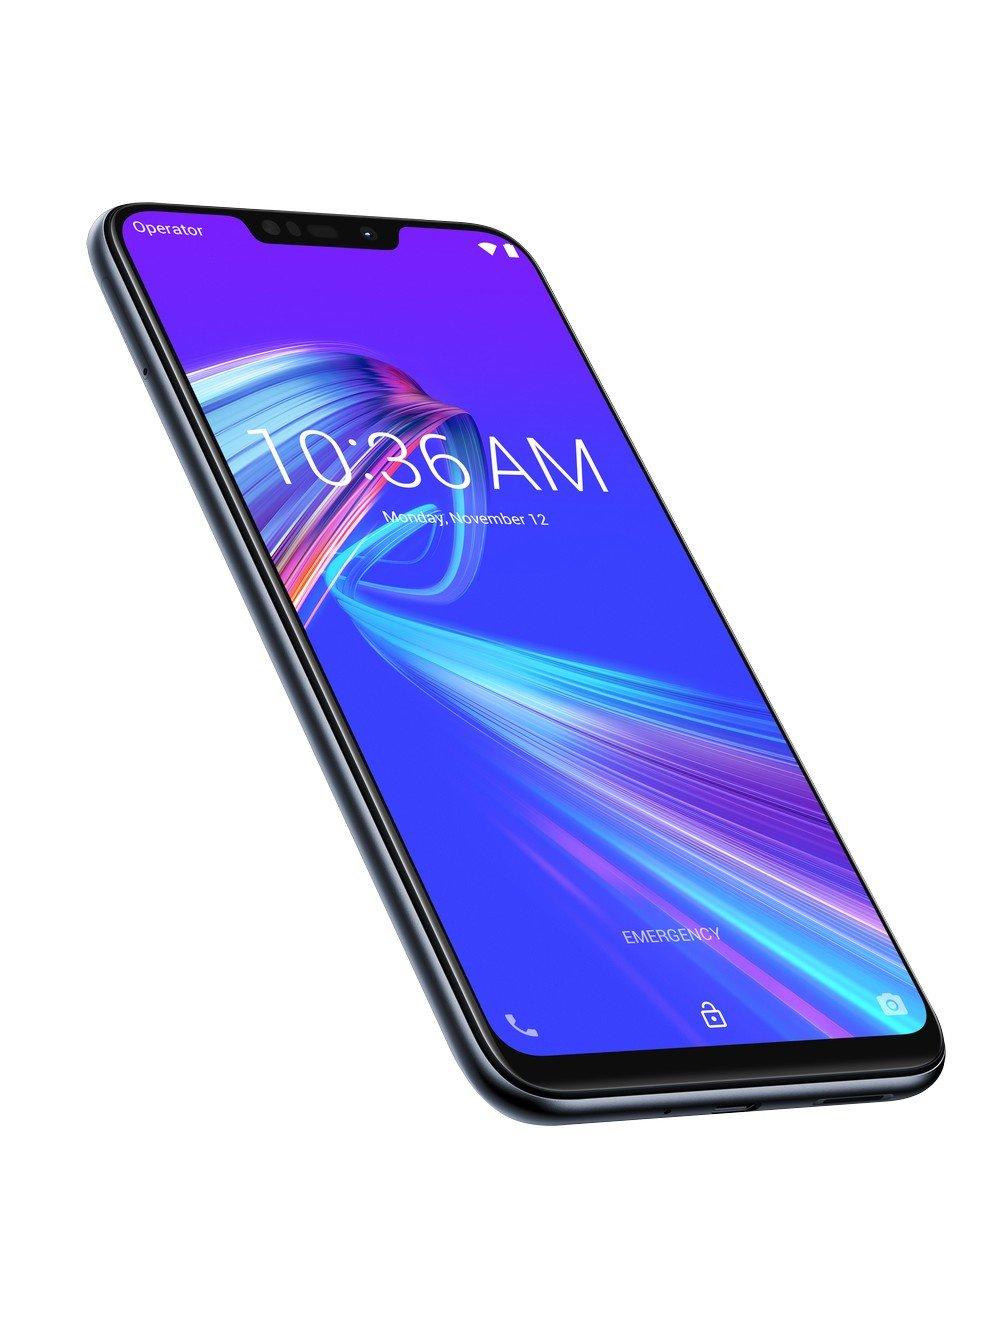 Смартфон Asus ZenFone Max (M2) (ZB633KL-4A070EU) 4/32 GB DUALSIM Black с чехлом фото 3